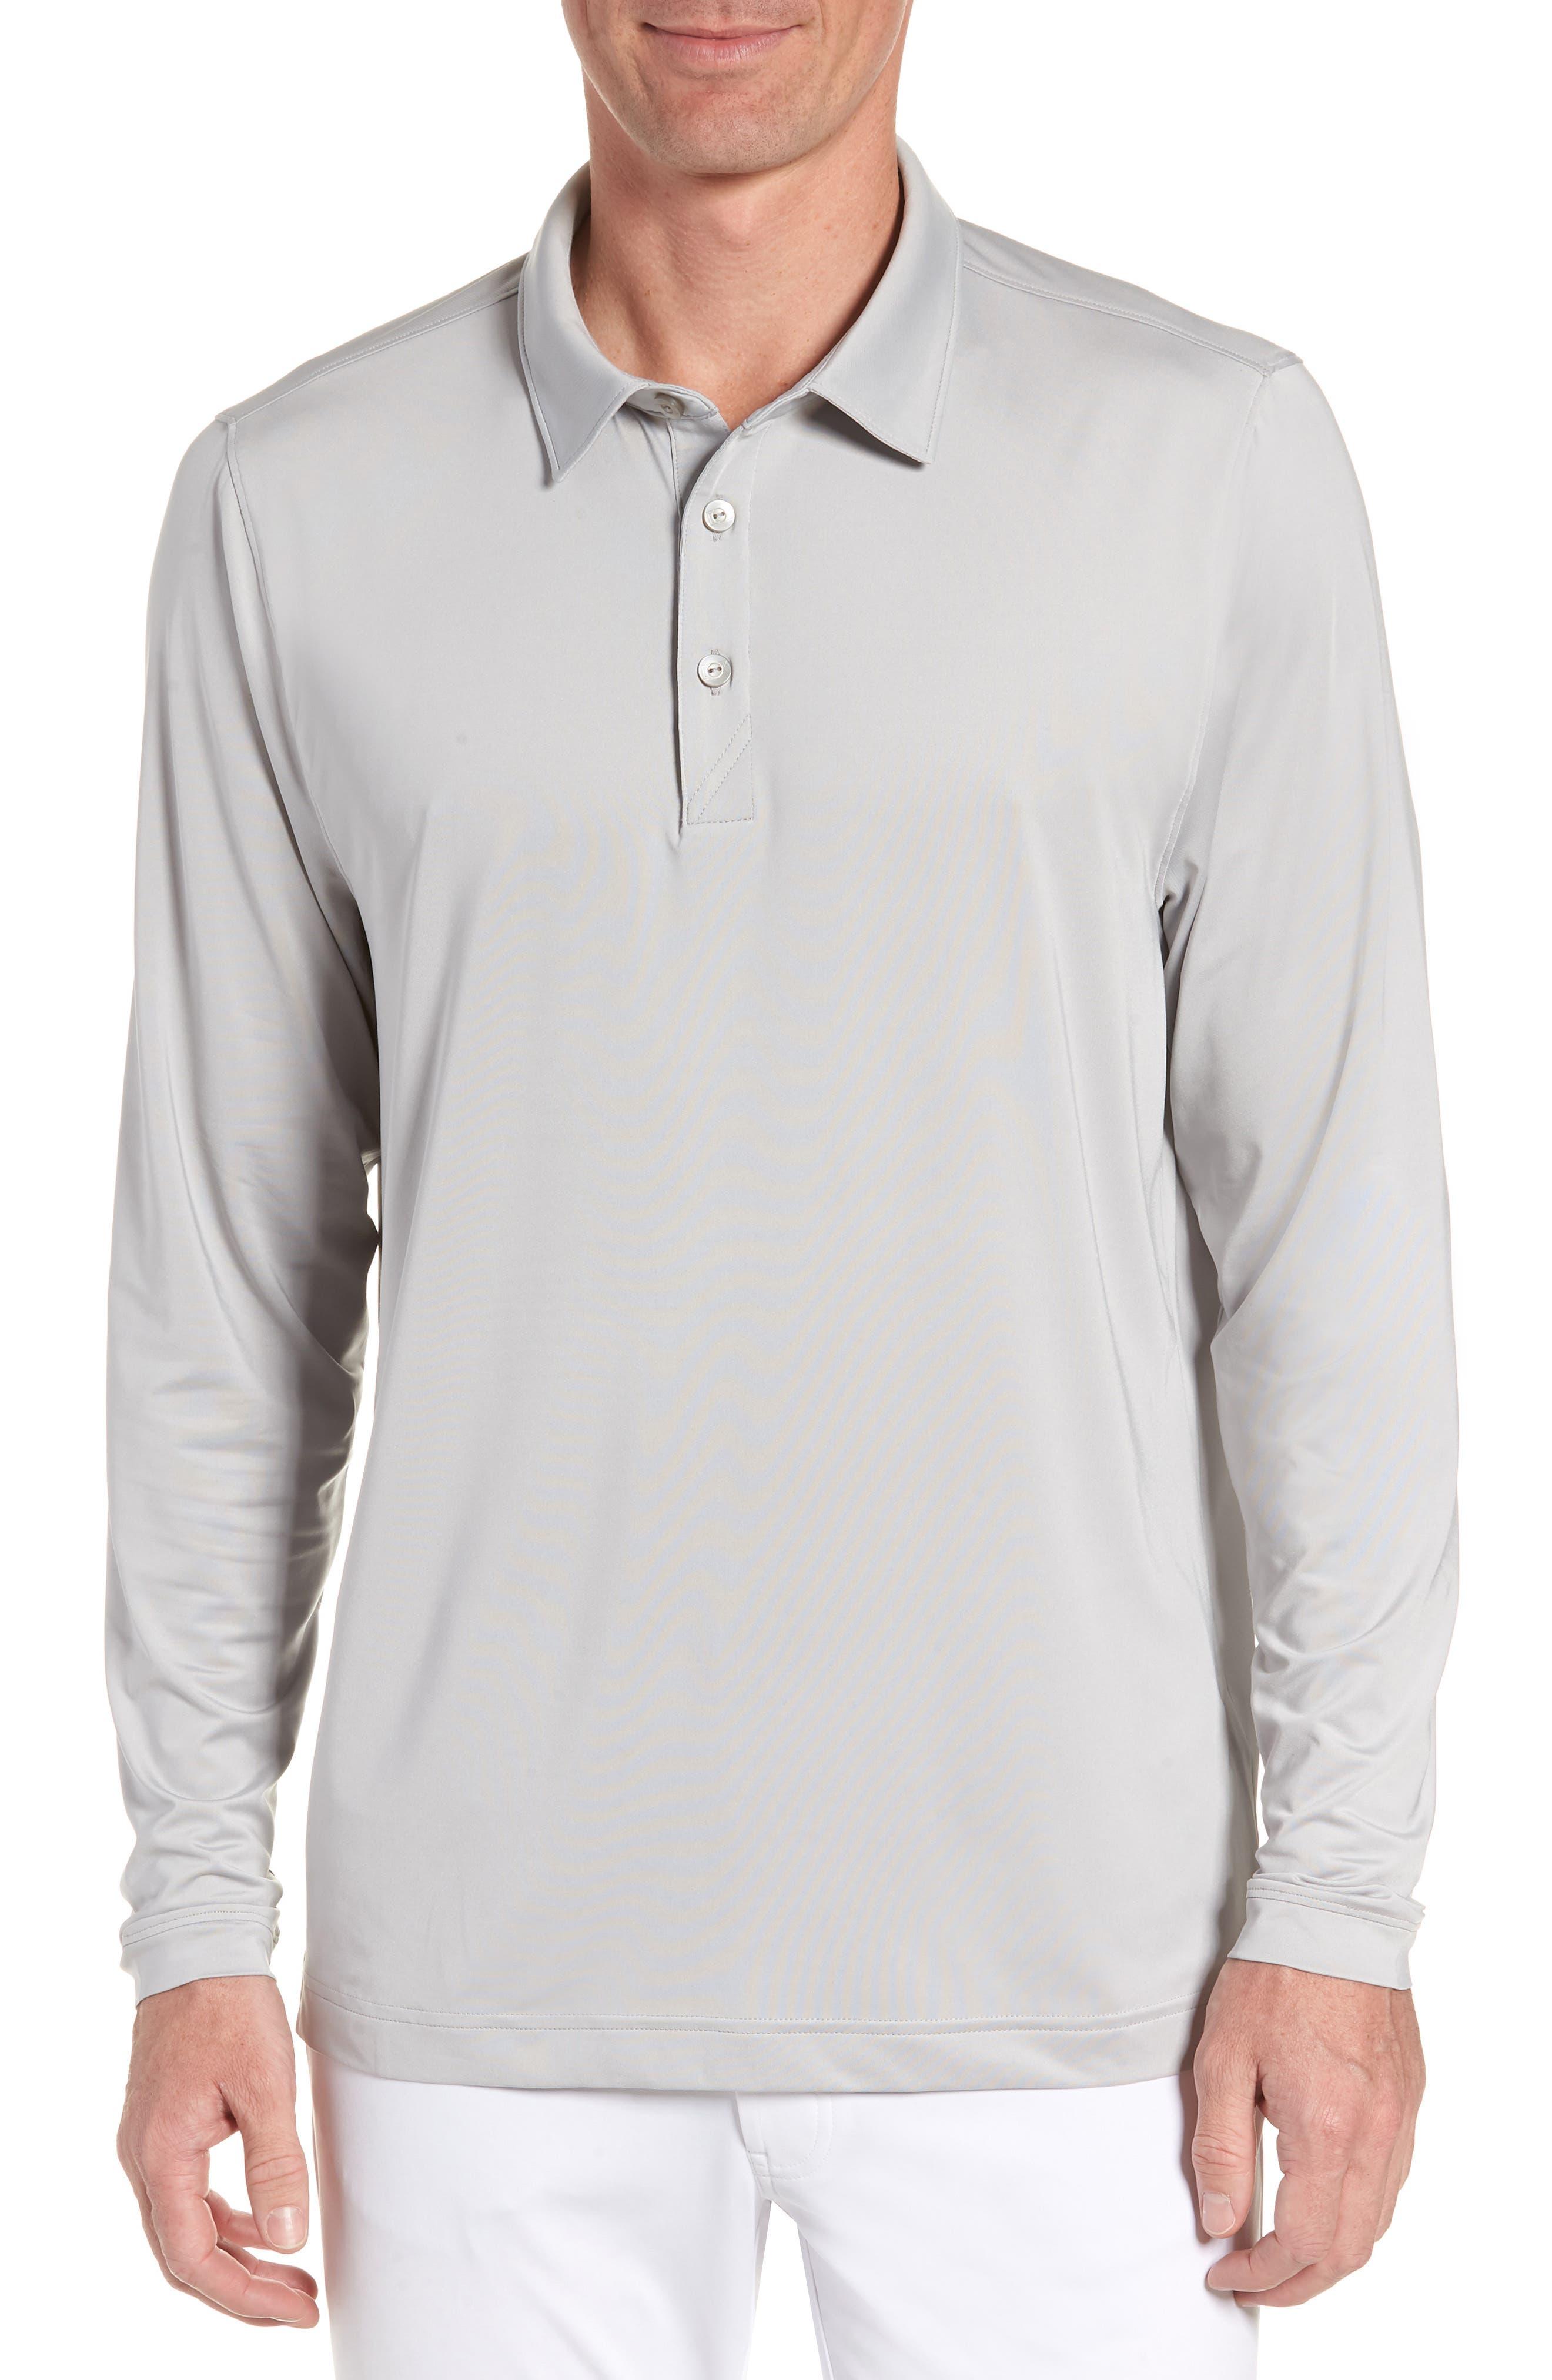 Cutter & Buck Belmont Long Sleeve Solid Polo, Grey